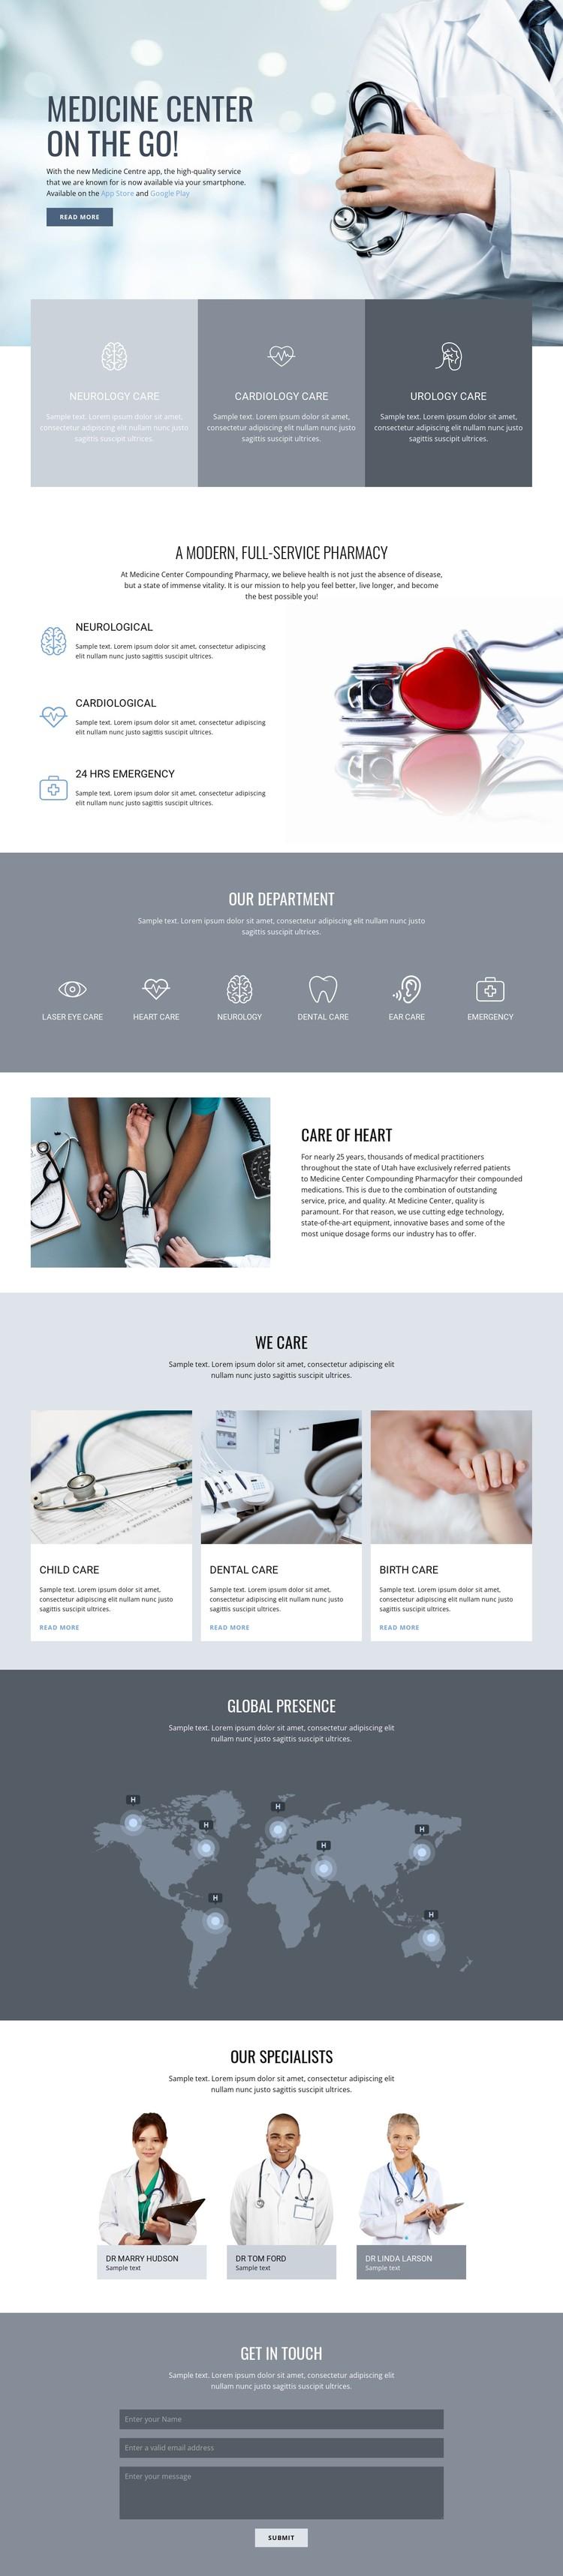 Center of quality medicine Static Site Generator